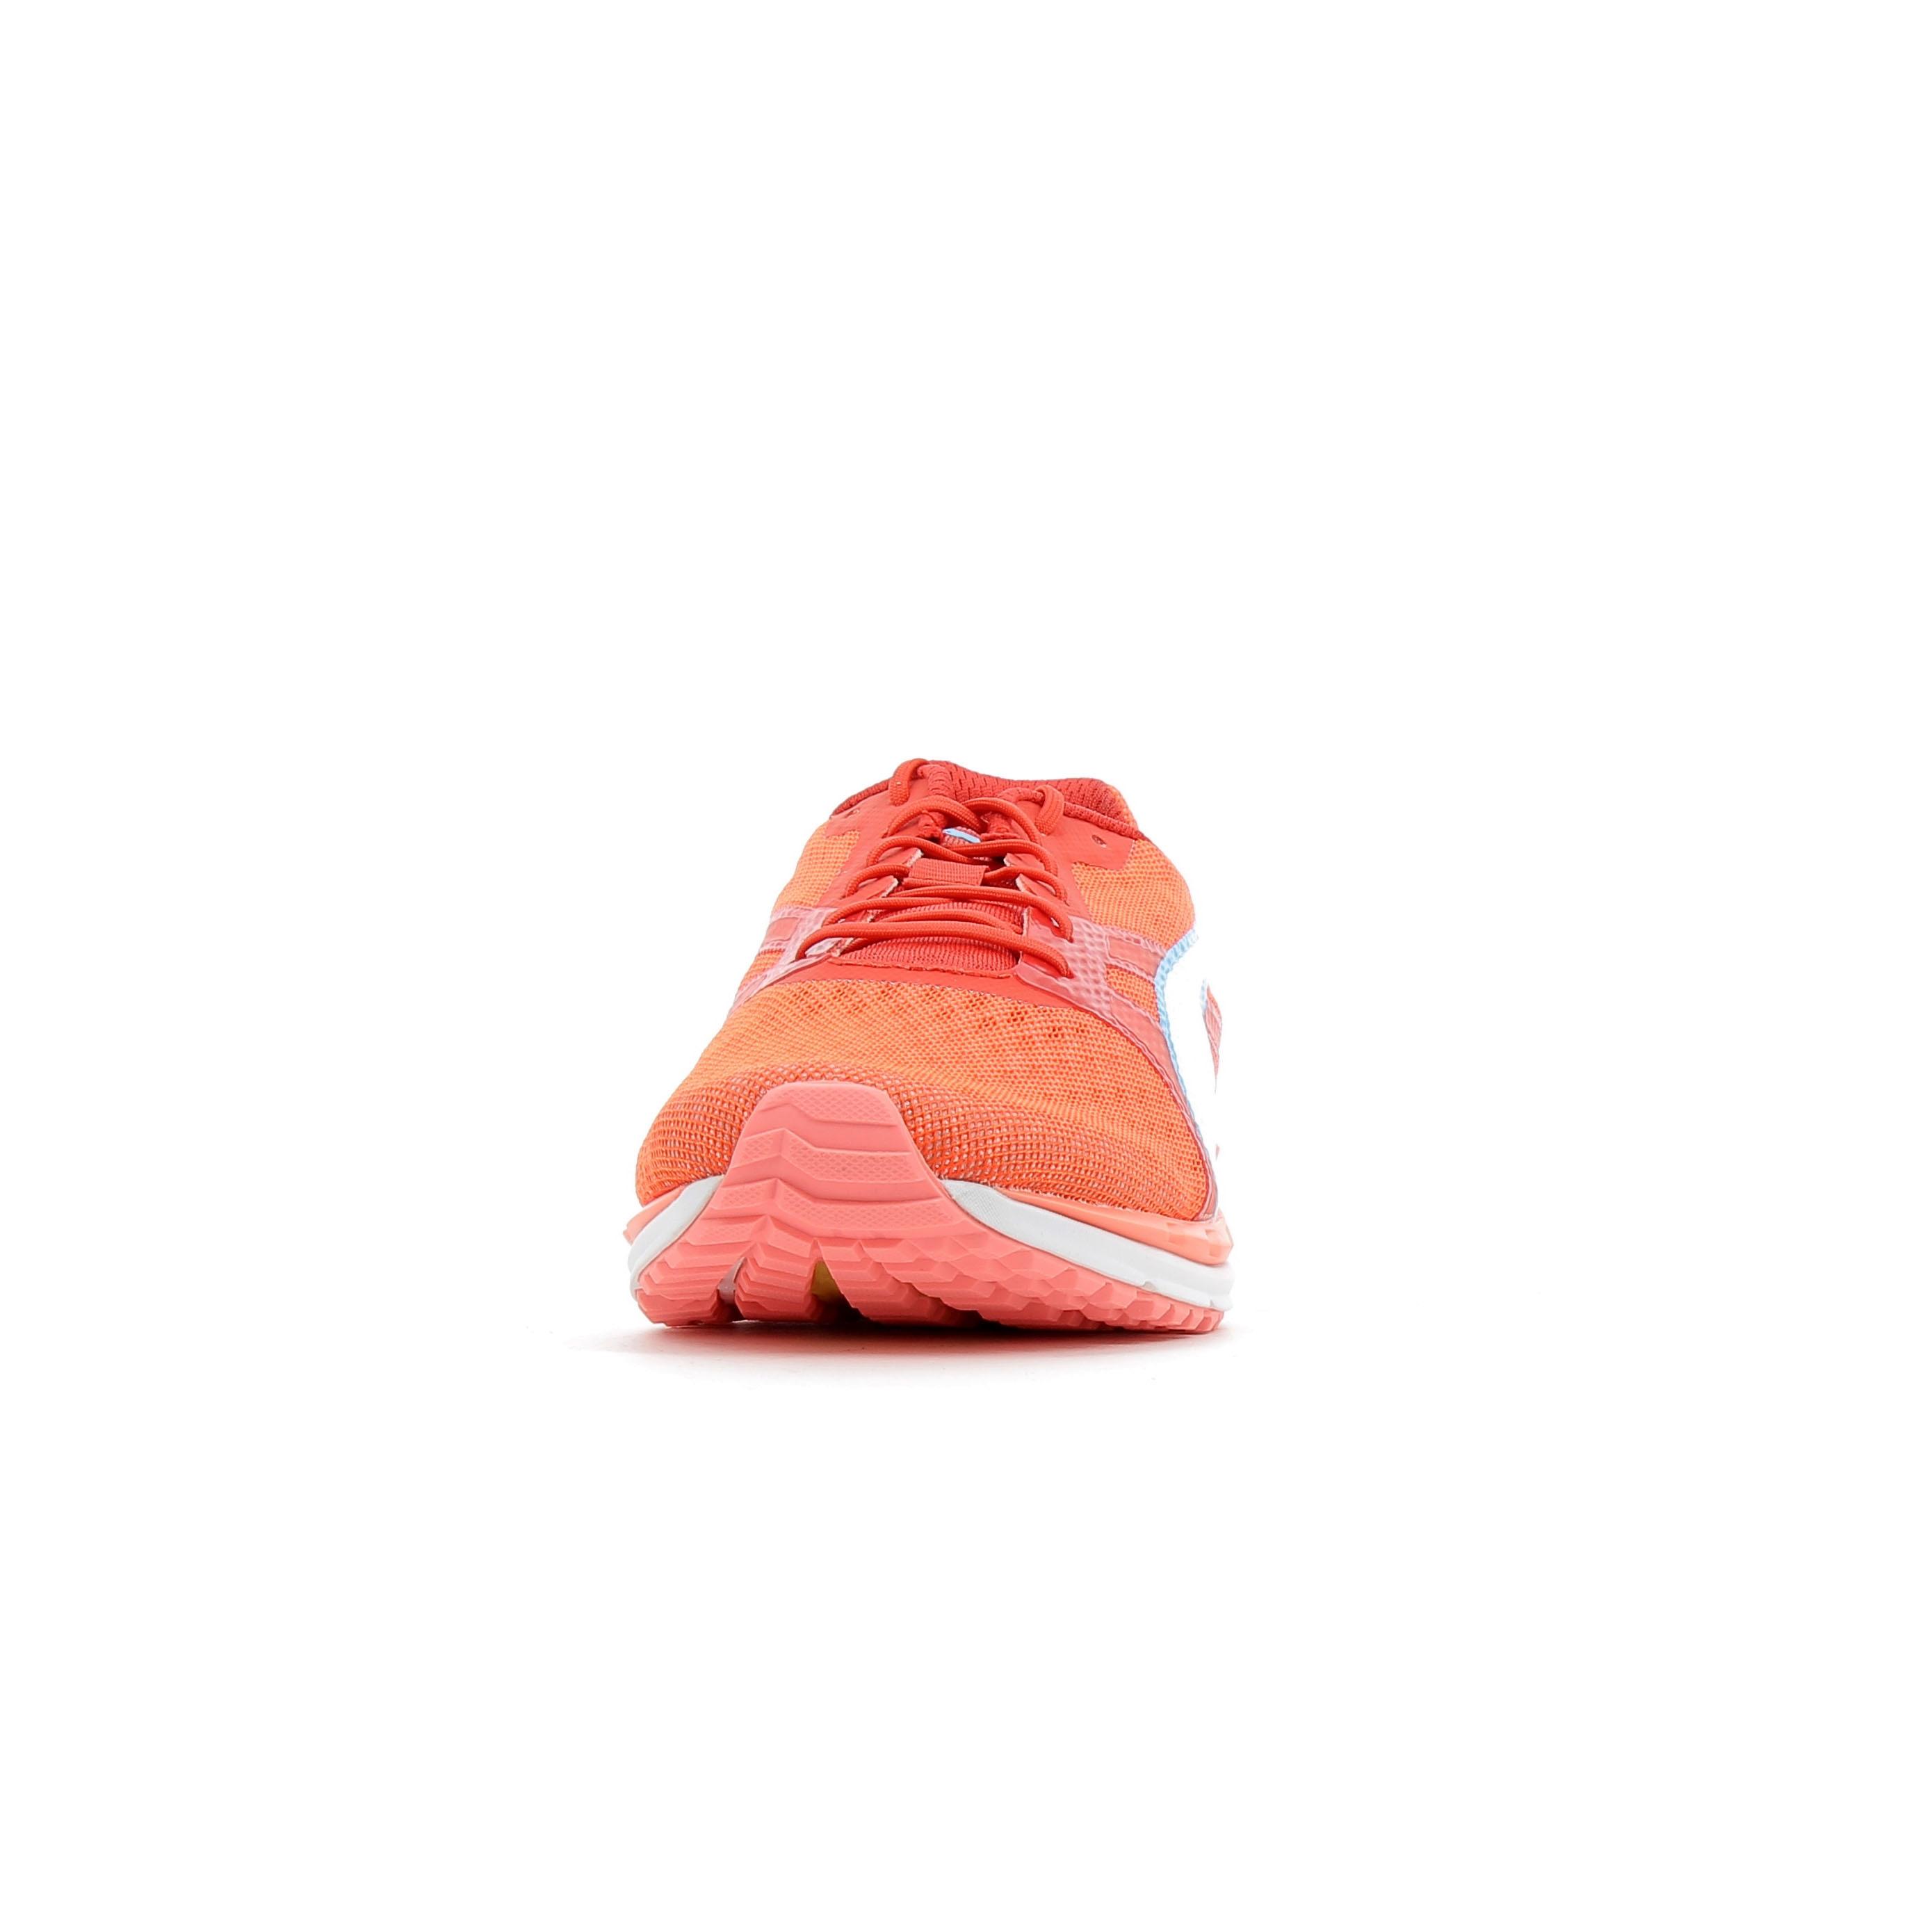 the latest 94b85 da4d1 Chaussures de Running Femme Puma Speed 300 IGNITE 2 Orange